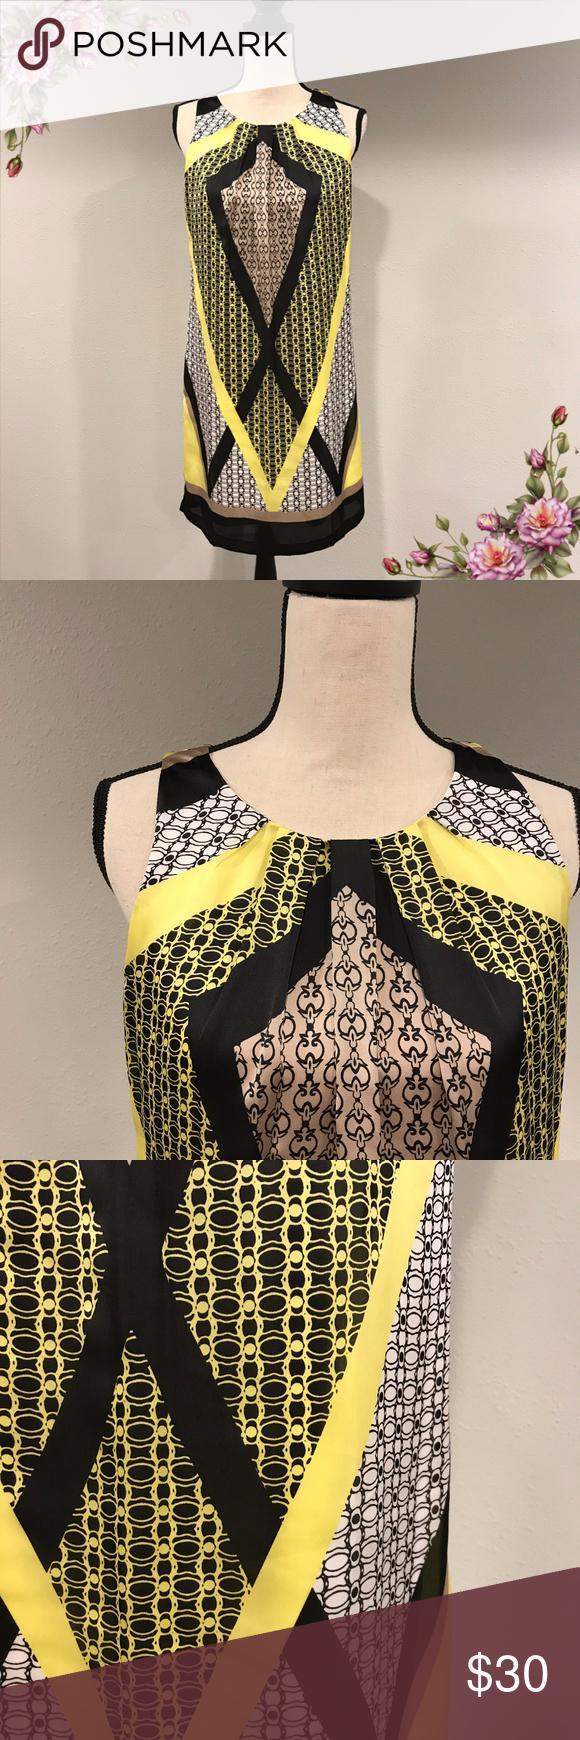 MAKE AN OFFER ;) Geometric sleeveless dress #blacksleevelessdress